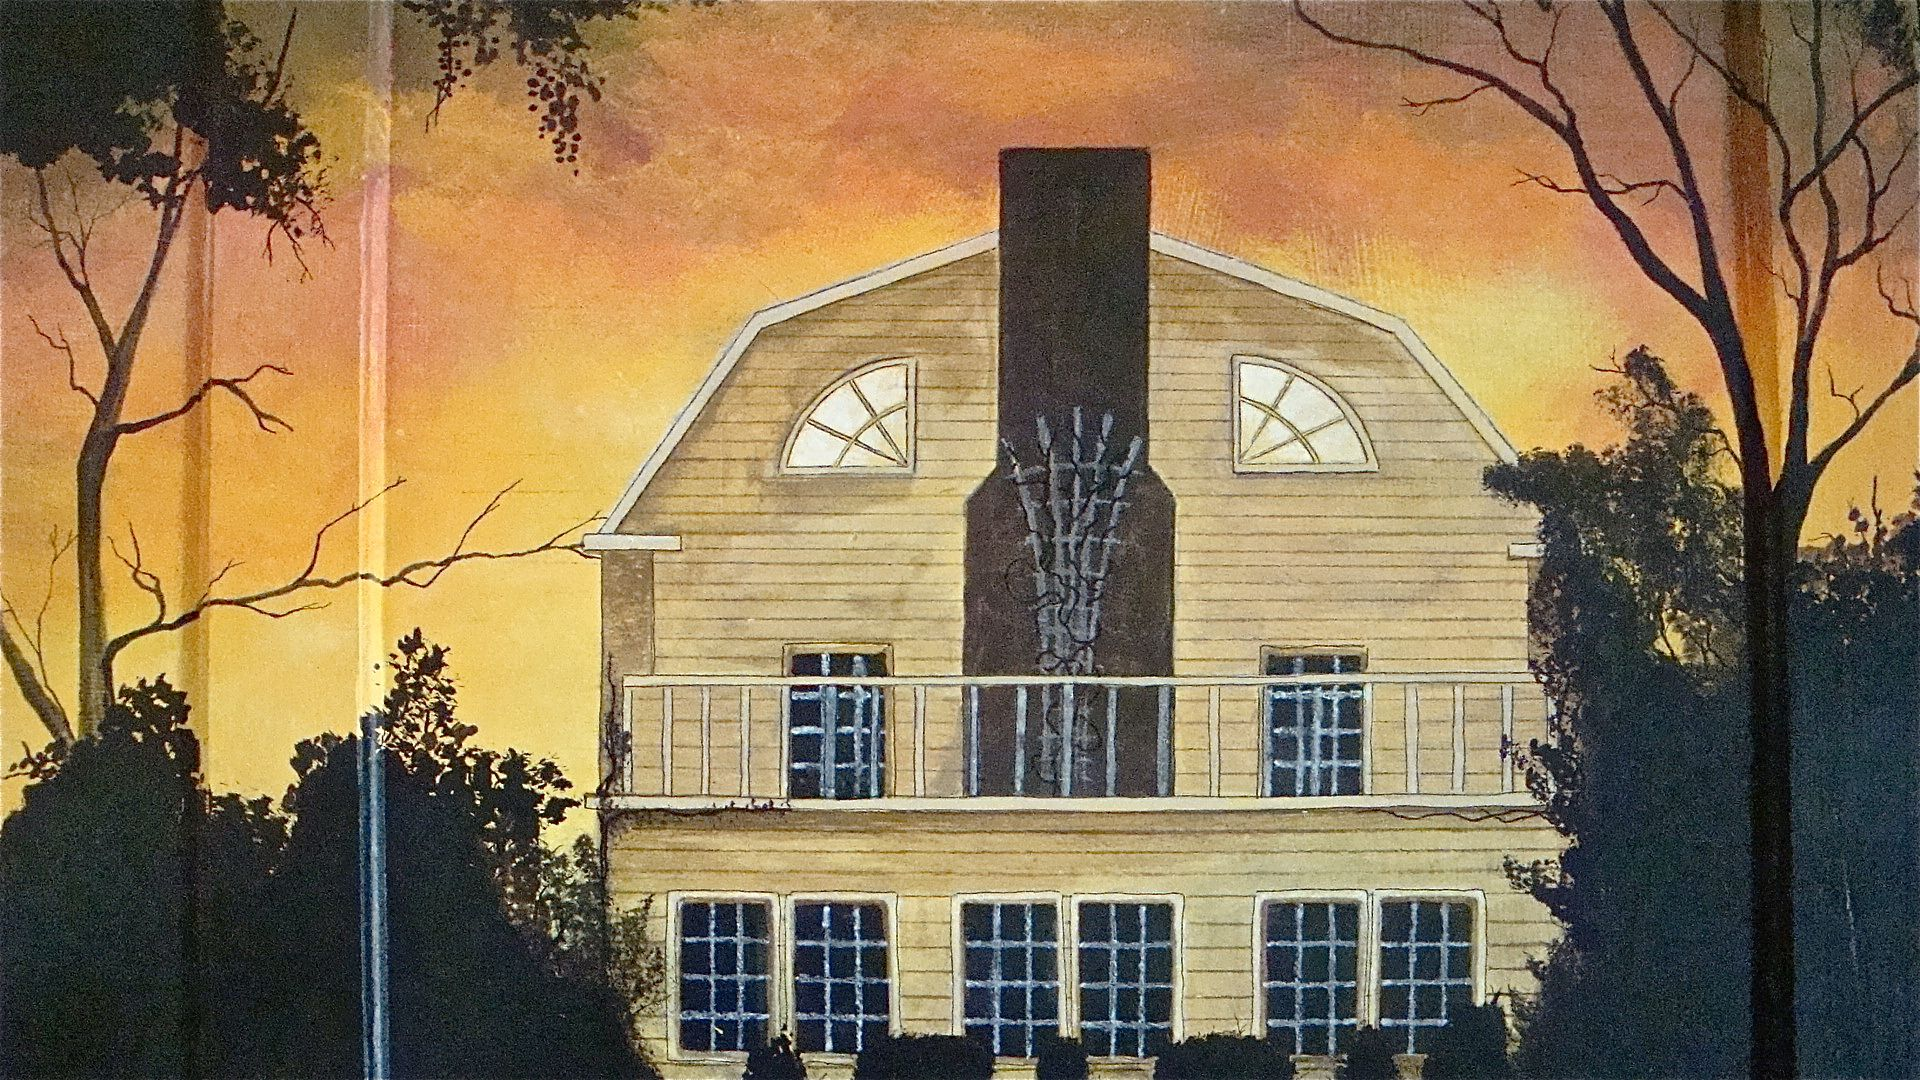 Amityville Horror House by glenn grassi